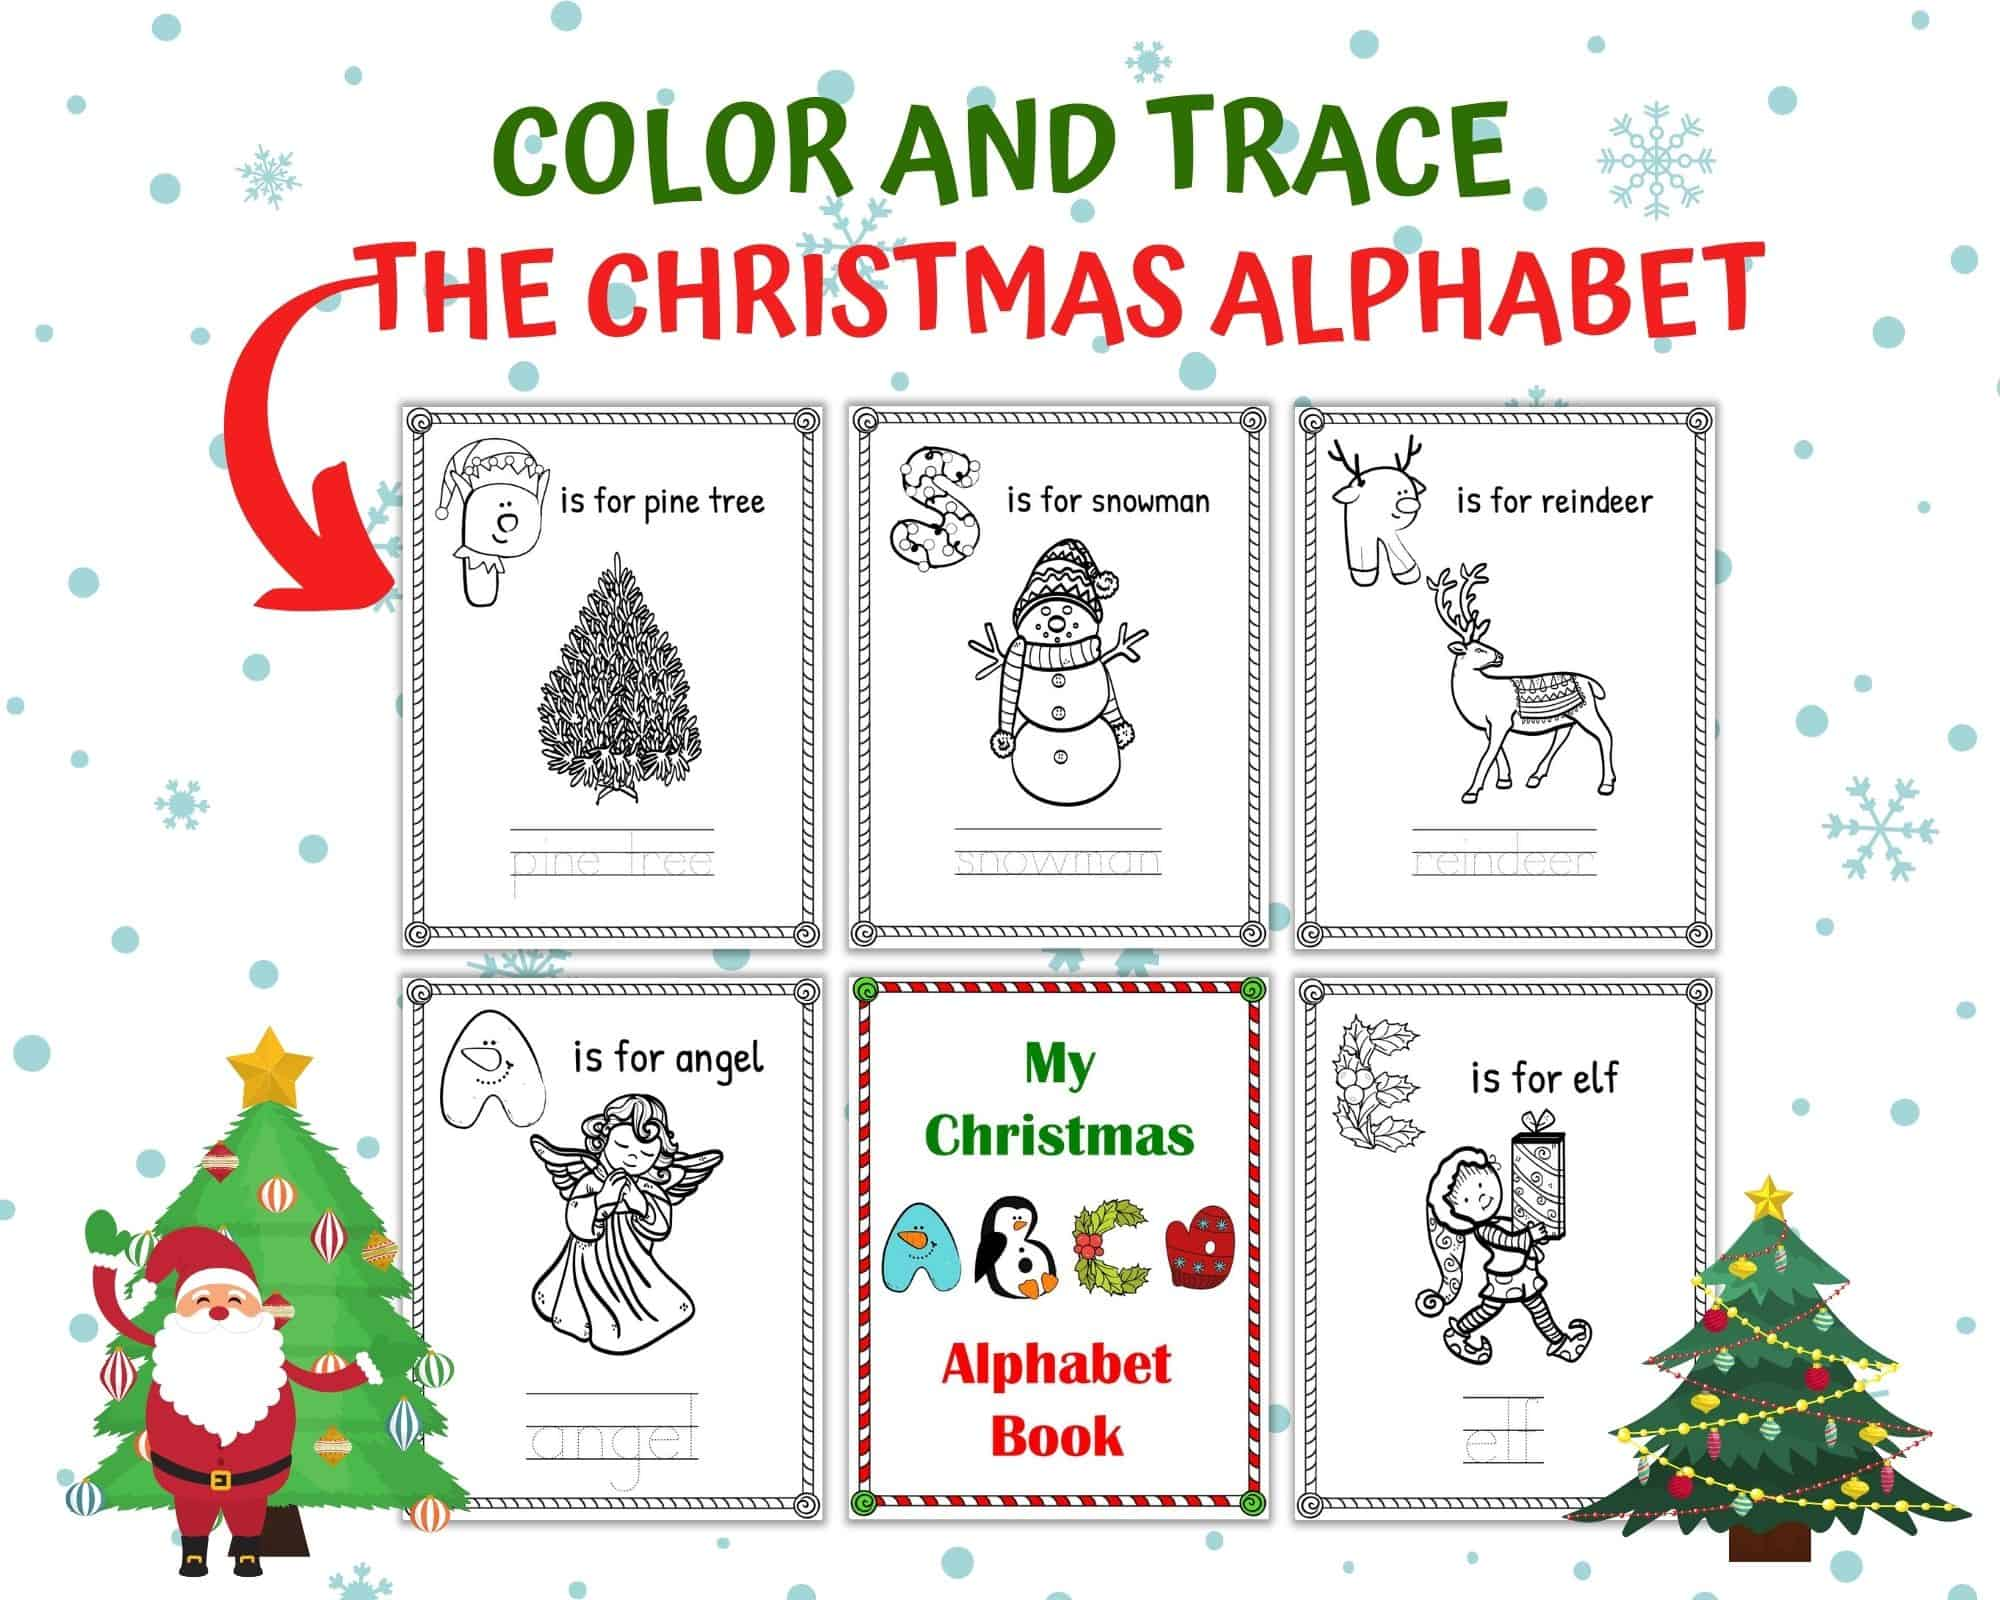 Free Christmas Alphabet Worksheets For Kindergarten